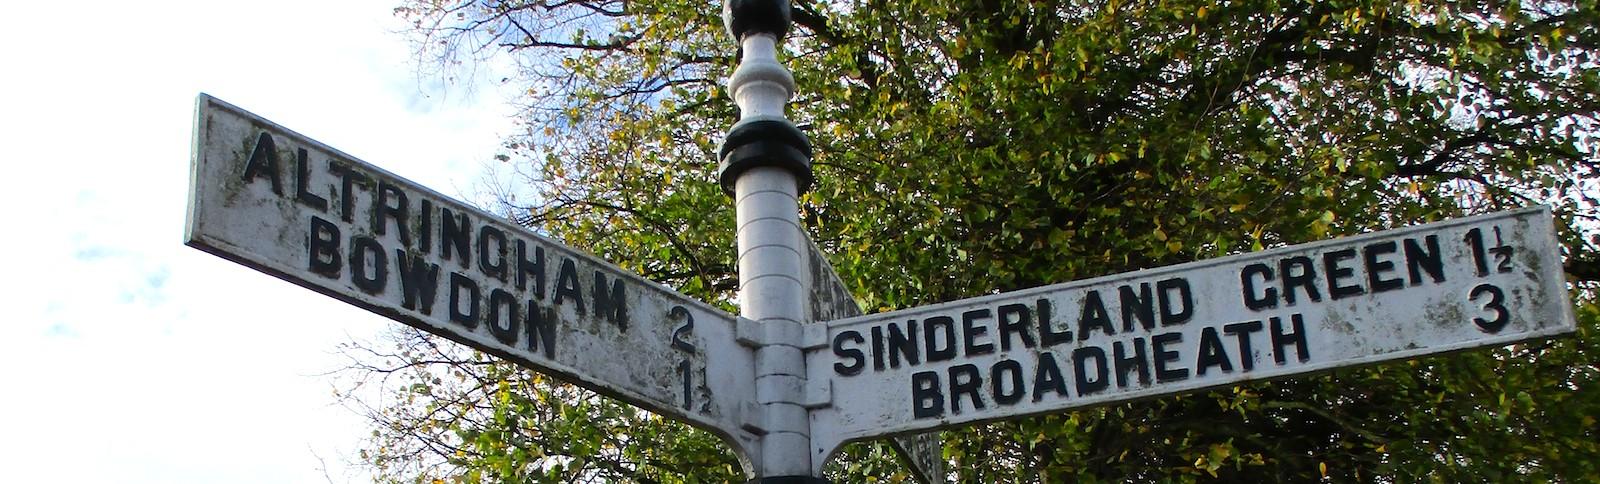 1 Signpost